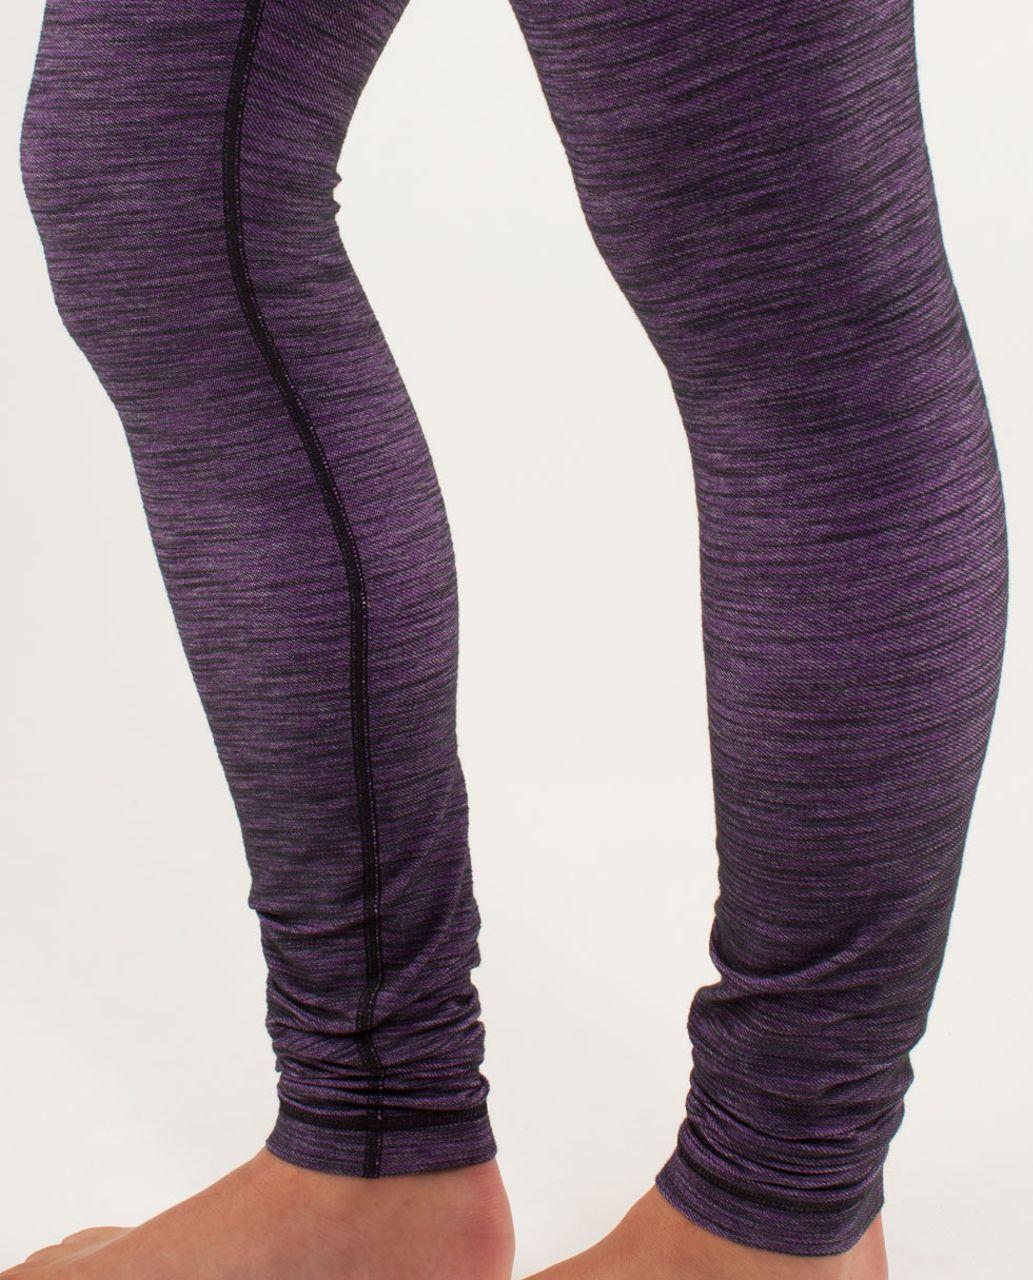 Lululemon Wunder Under Pant *Denim - Reversible Slub Denim Tender Violet